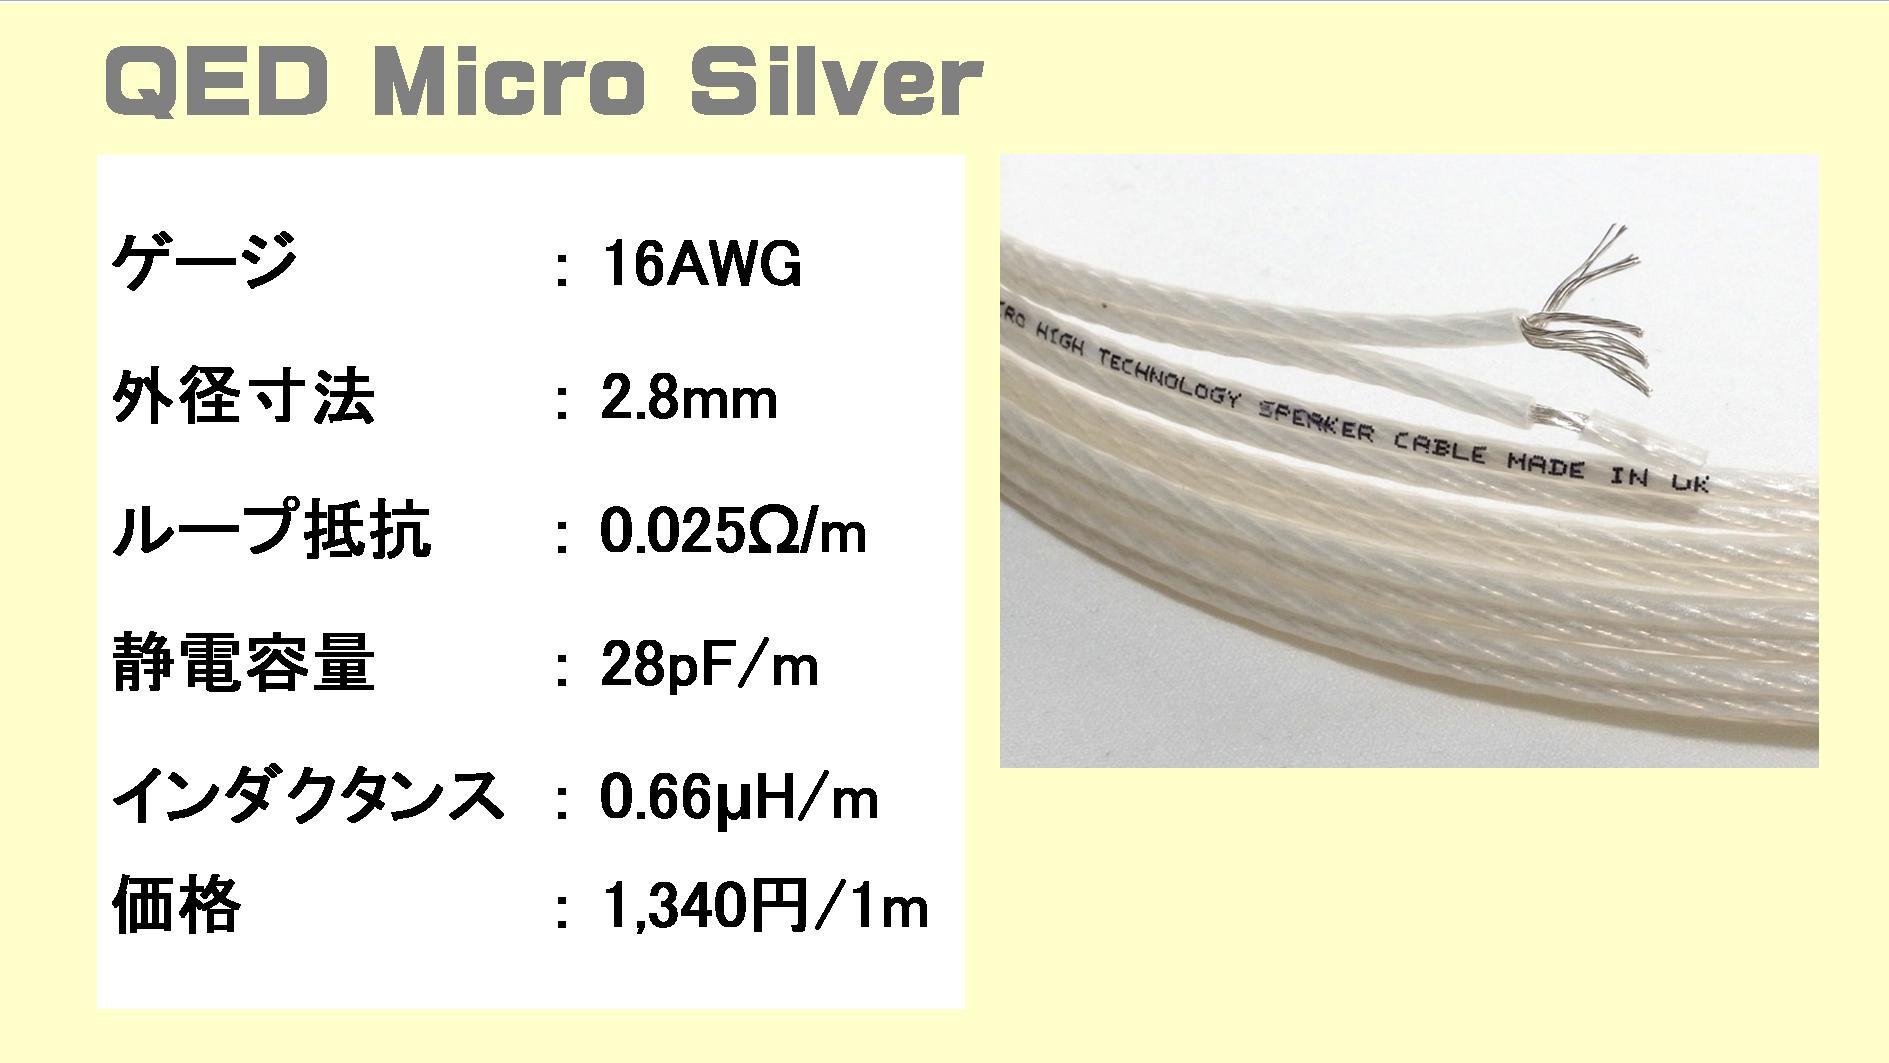 QED erformance-Micro-Silverの仕様表(スペック表)